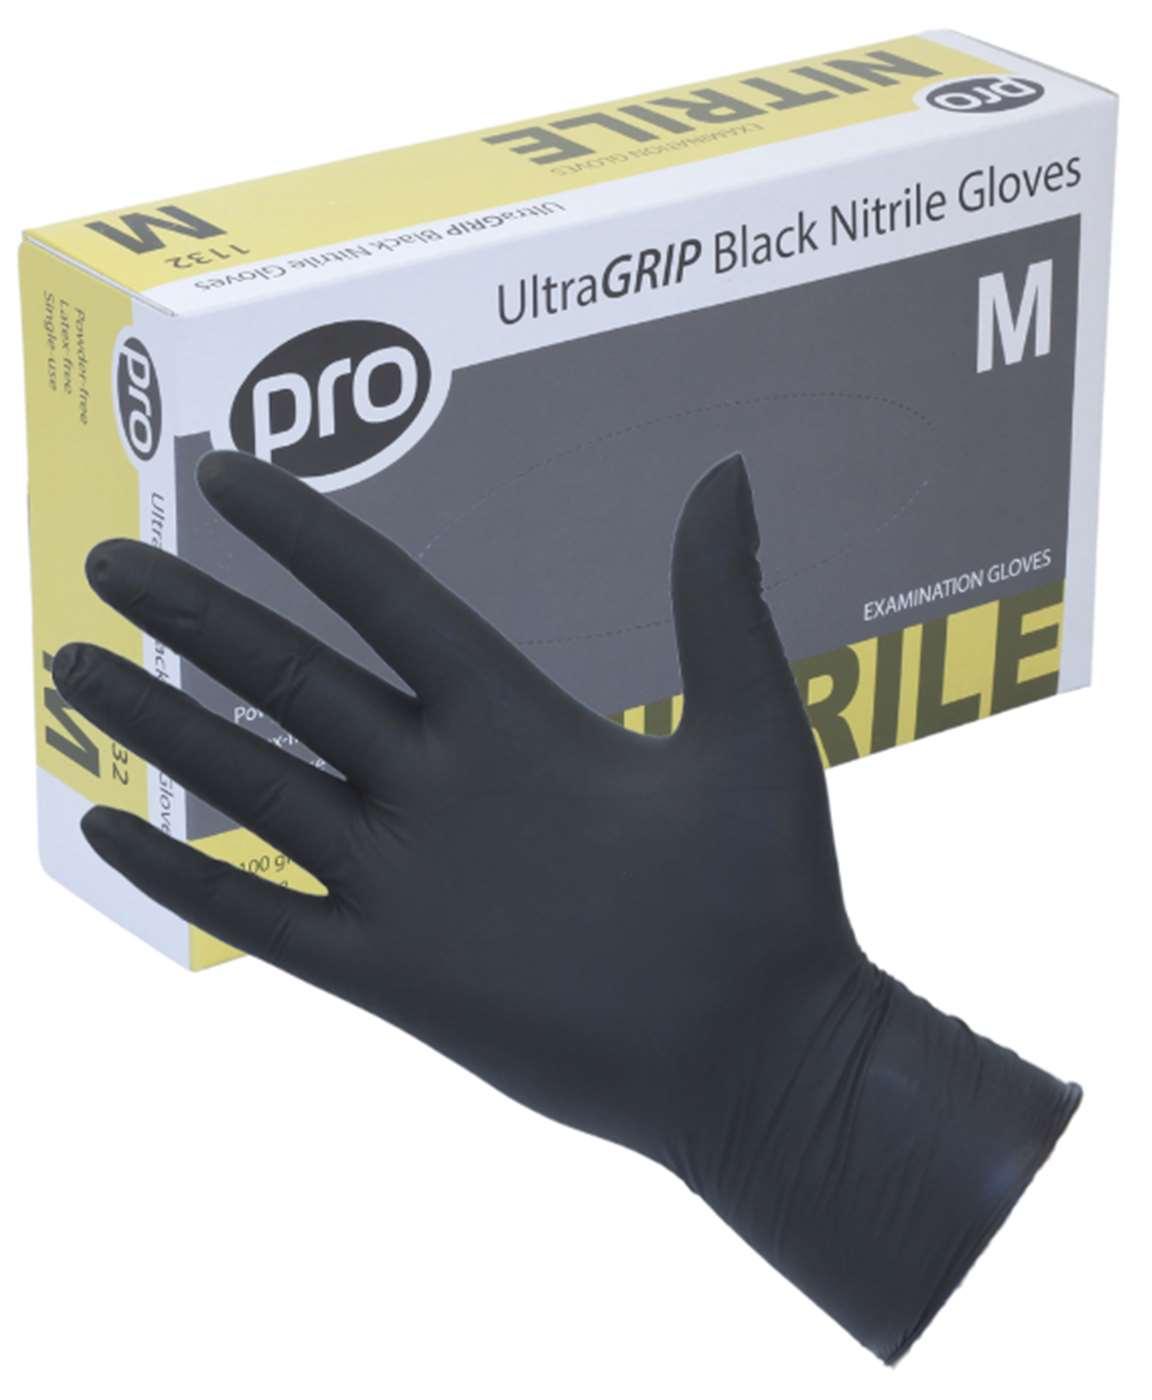 PRO UltraGRIP Black Nitrile Gloves